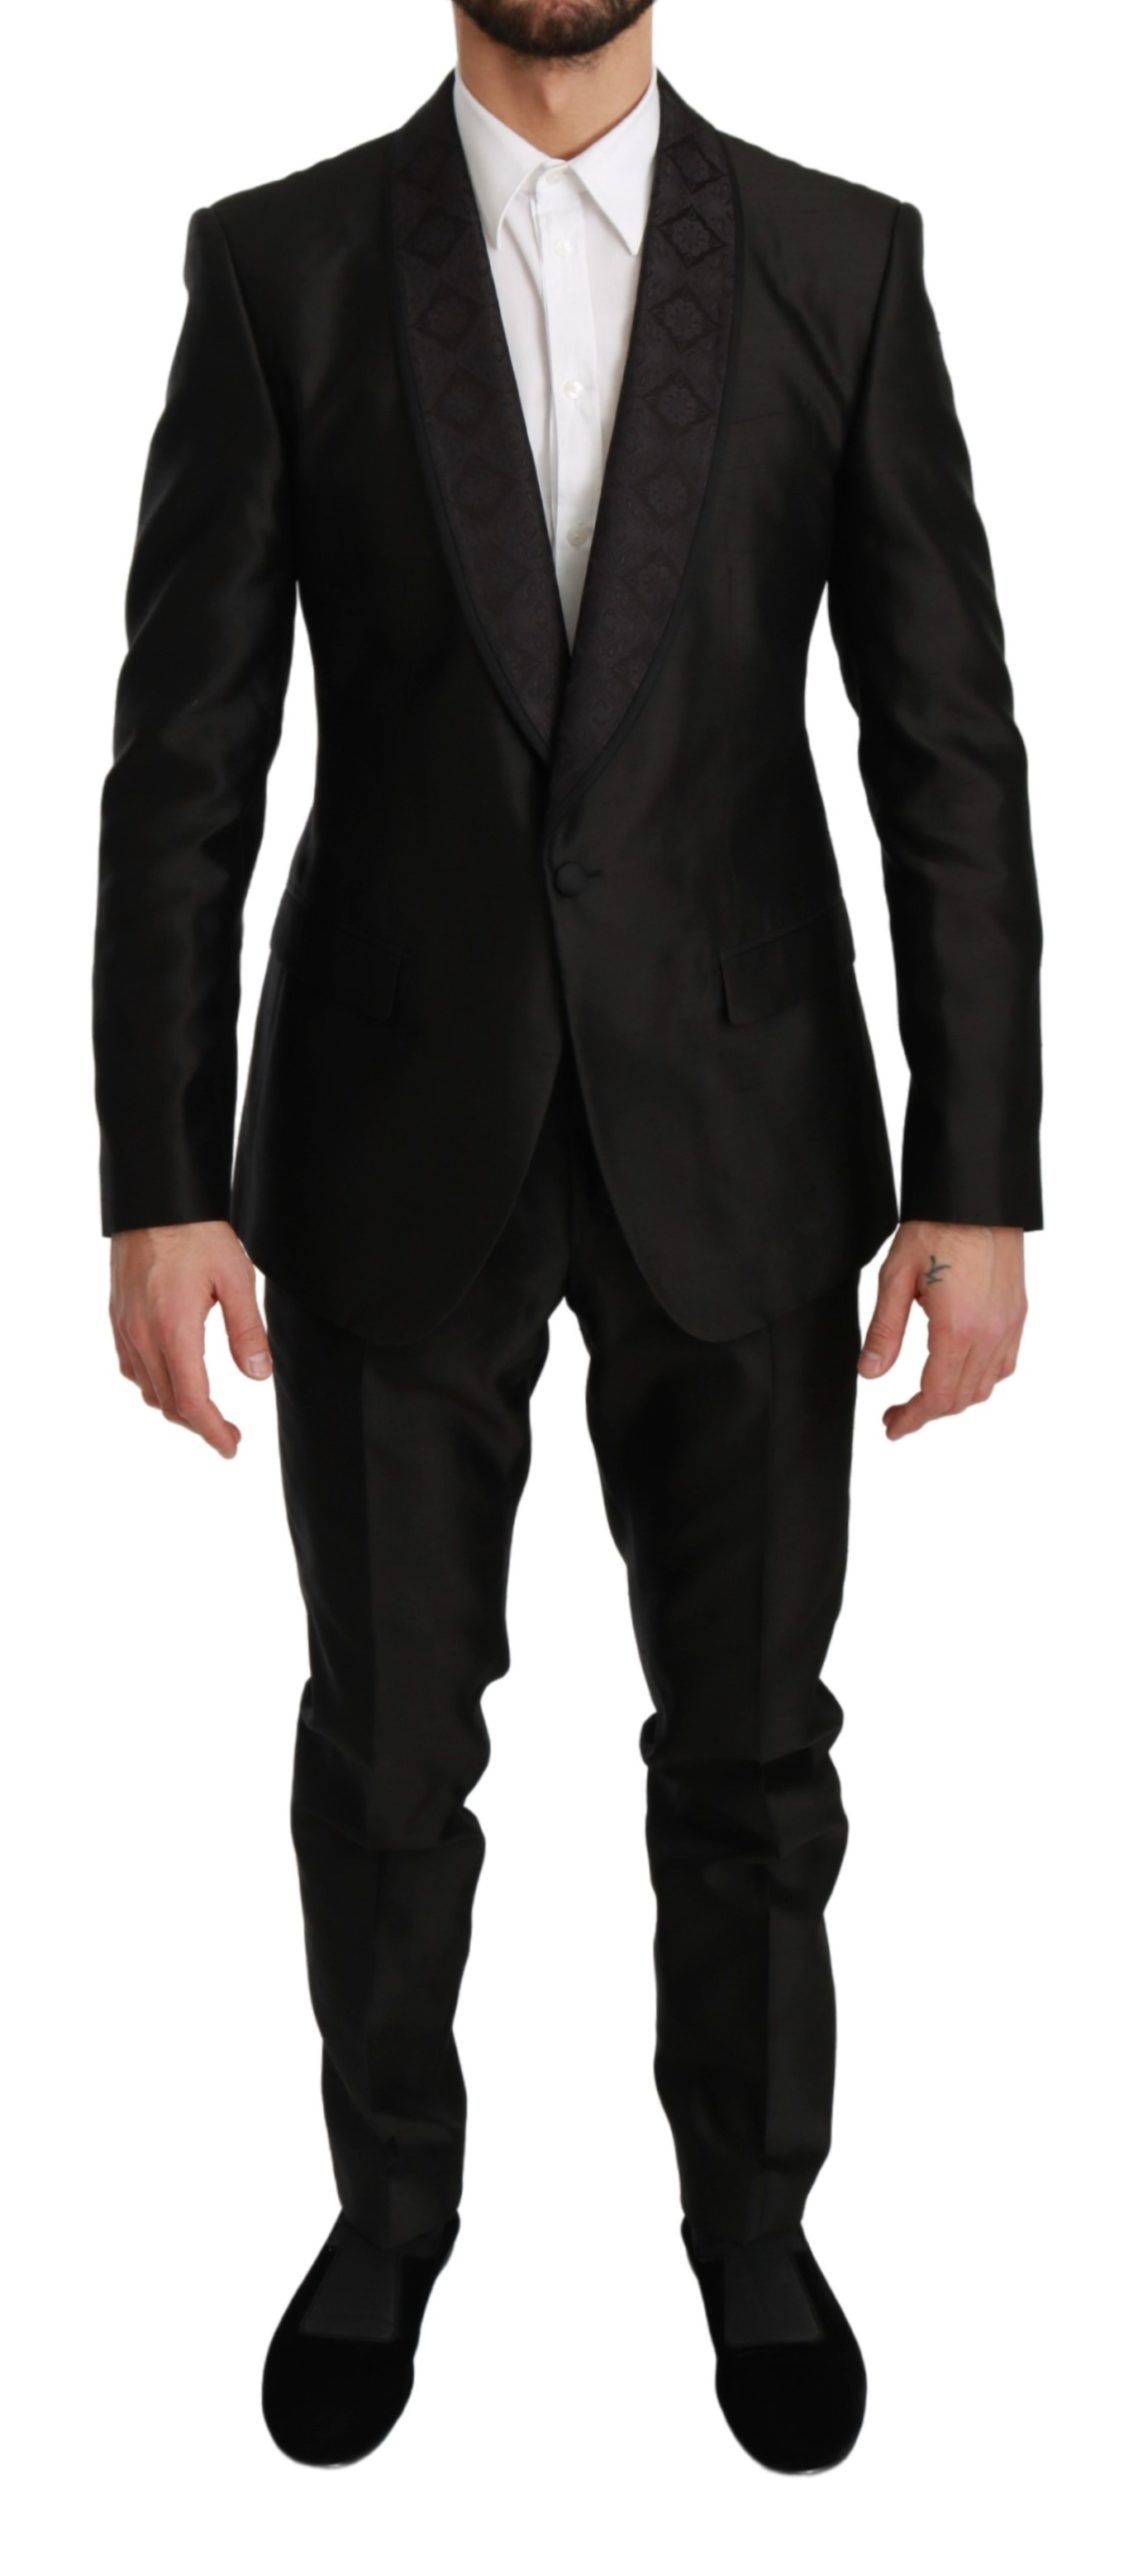 Dolce & Gabbana Men's Slim Fit 2 Piece MARTINI Silk Suit Black KOS1727 - IT48 | M